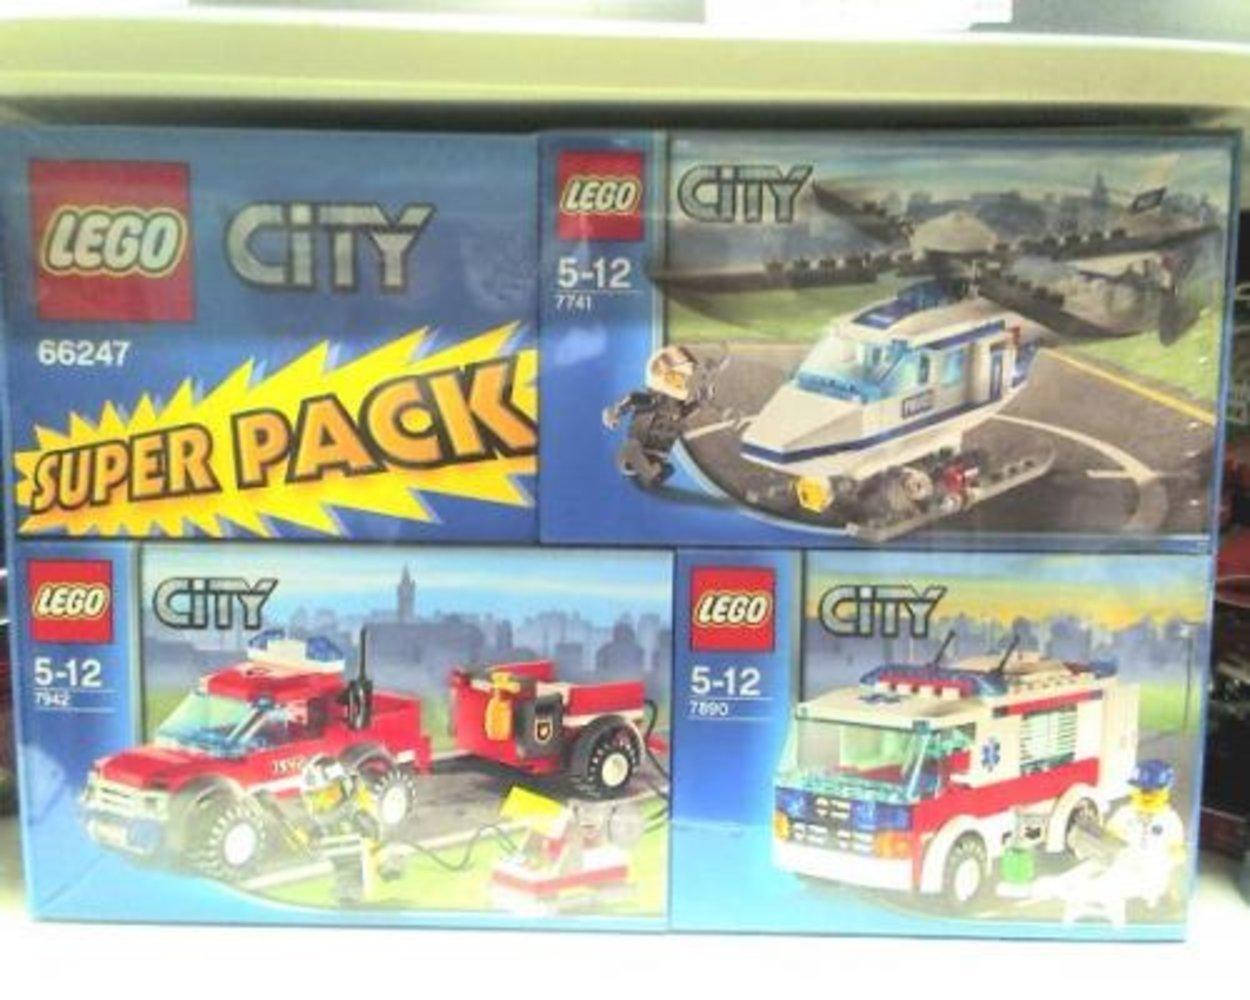 City Super Pack (7741 7890 7942)